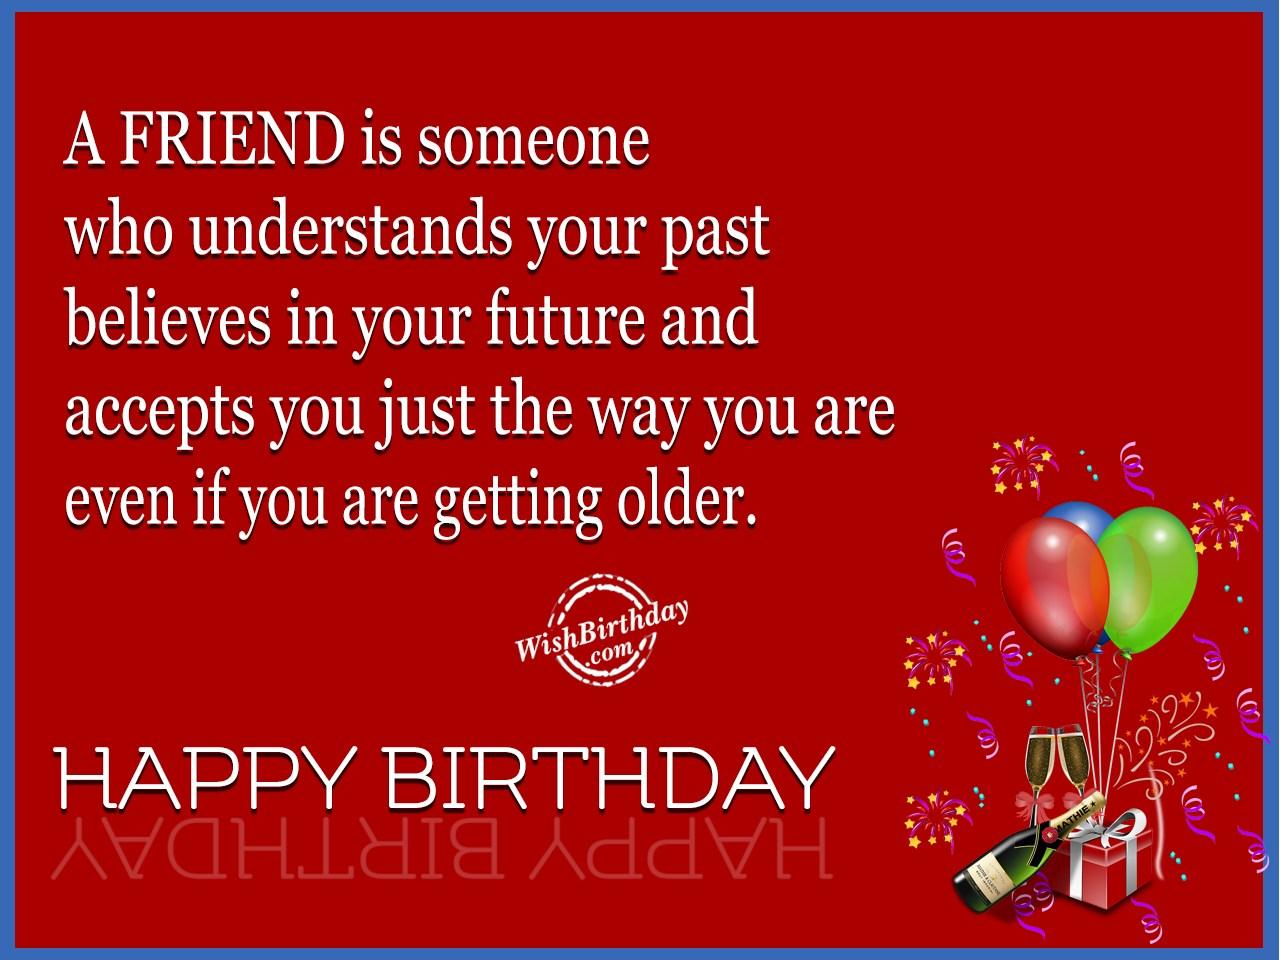 Wishing You Very Happy Birthday Wishes